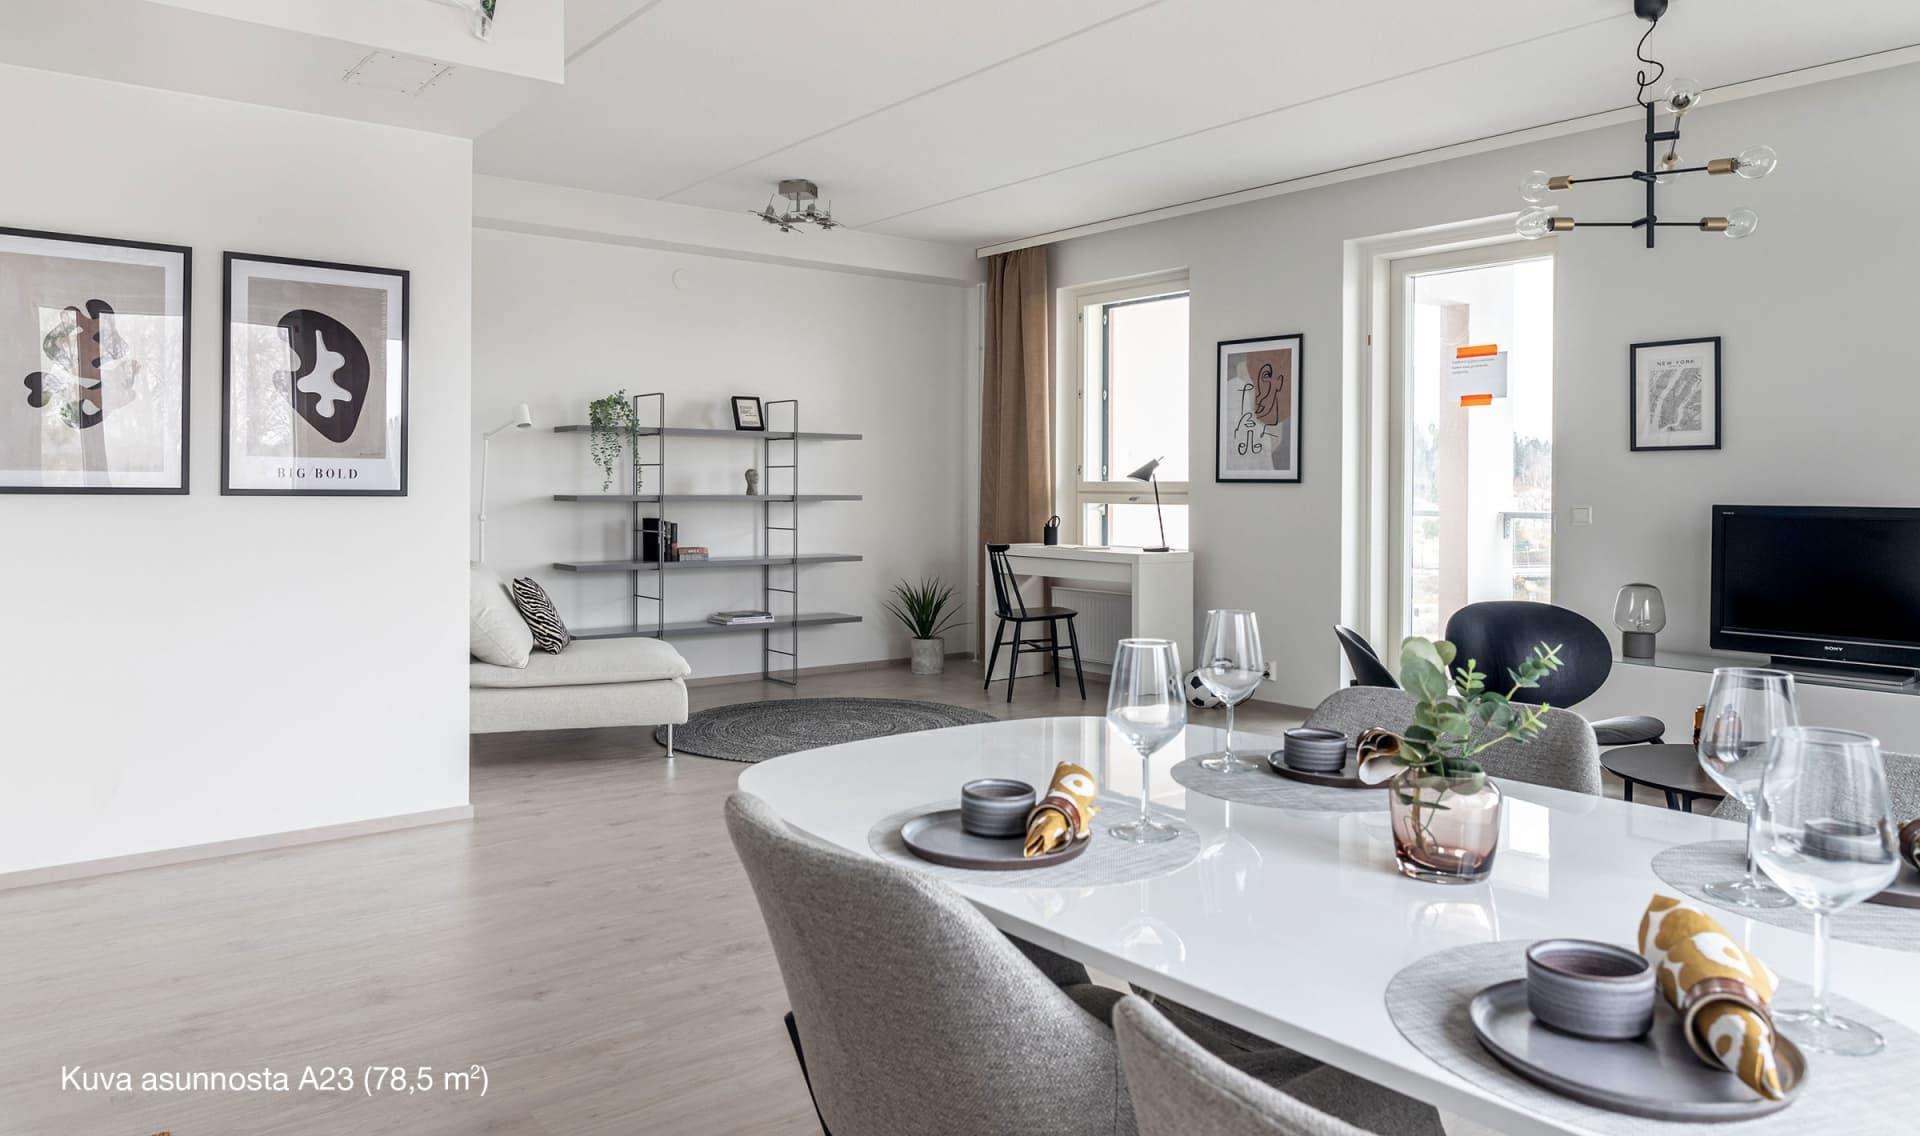 Asunto Oy Nurmijärven Unikko, Viirinlaakso - asunto A 23